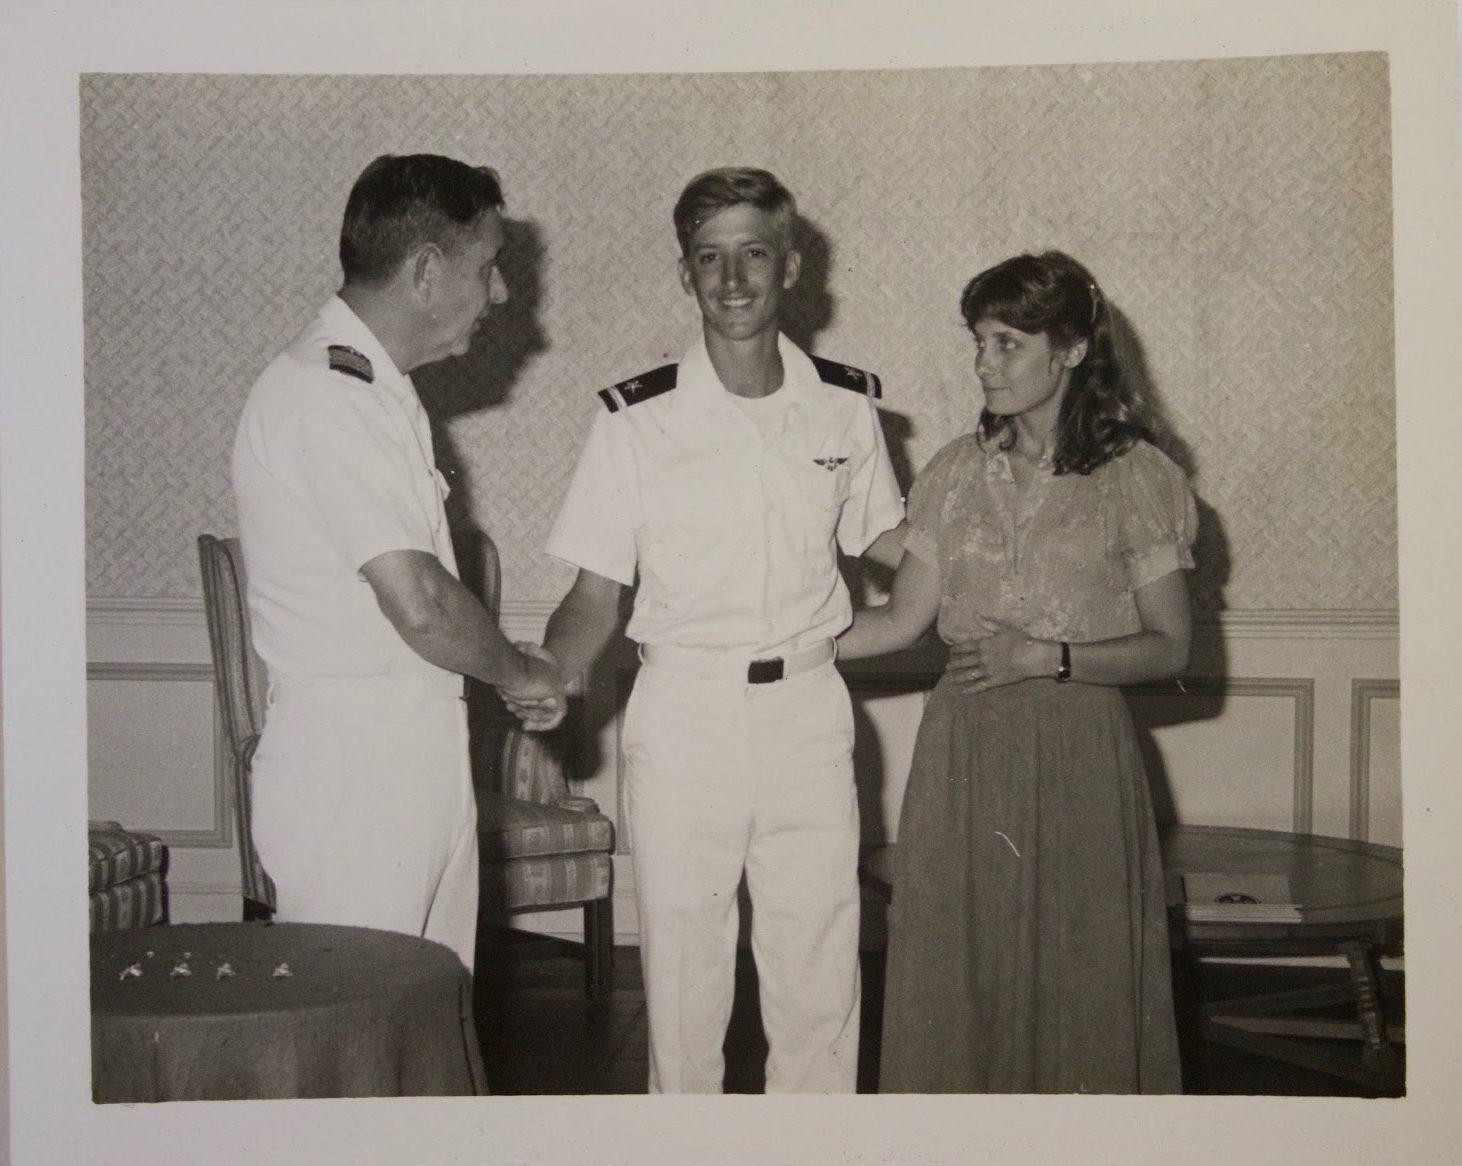 Auburn graduate, Jim Holt, wearing his Naval aviation wings.